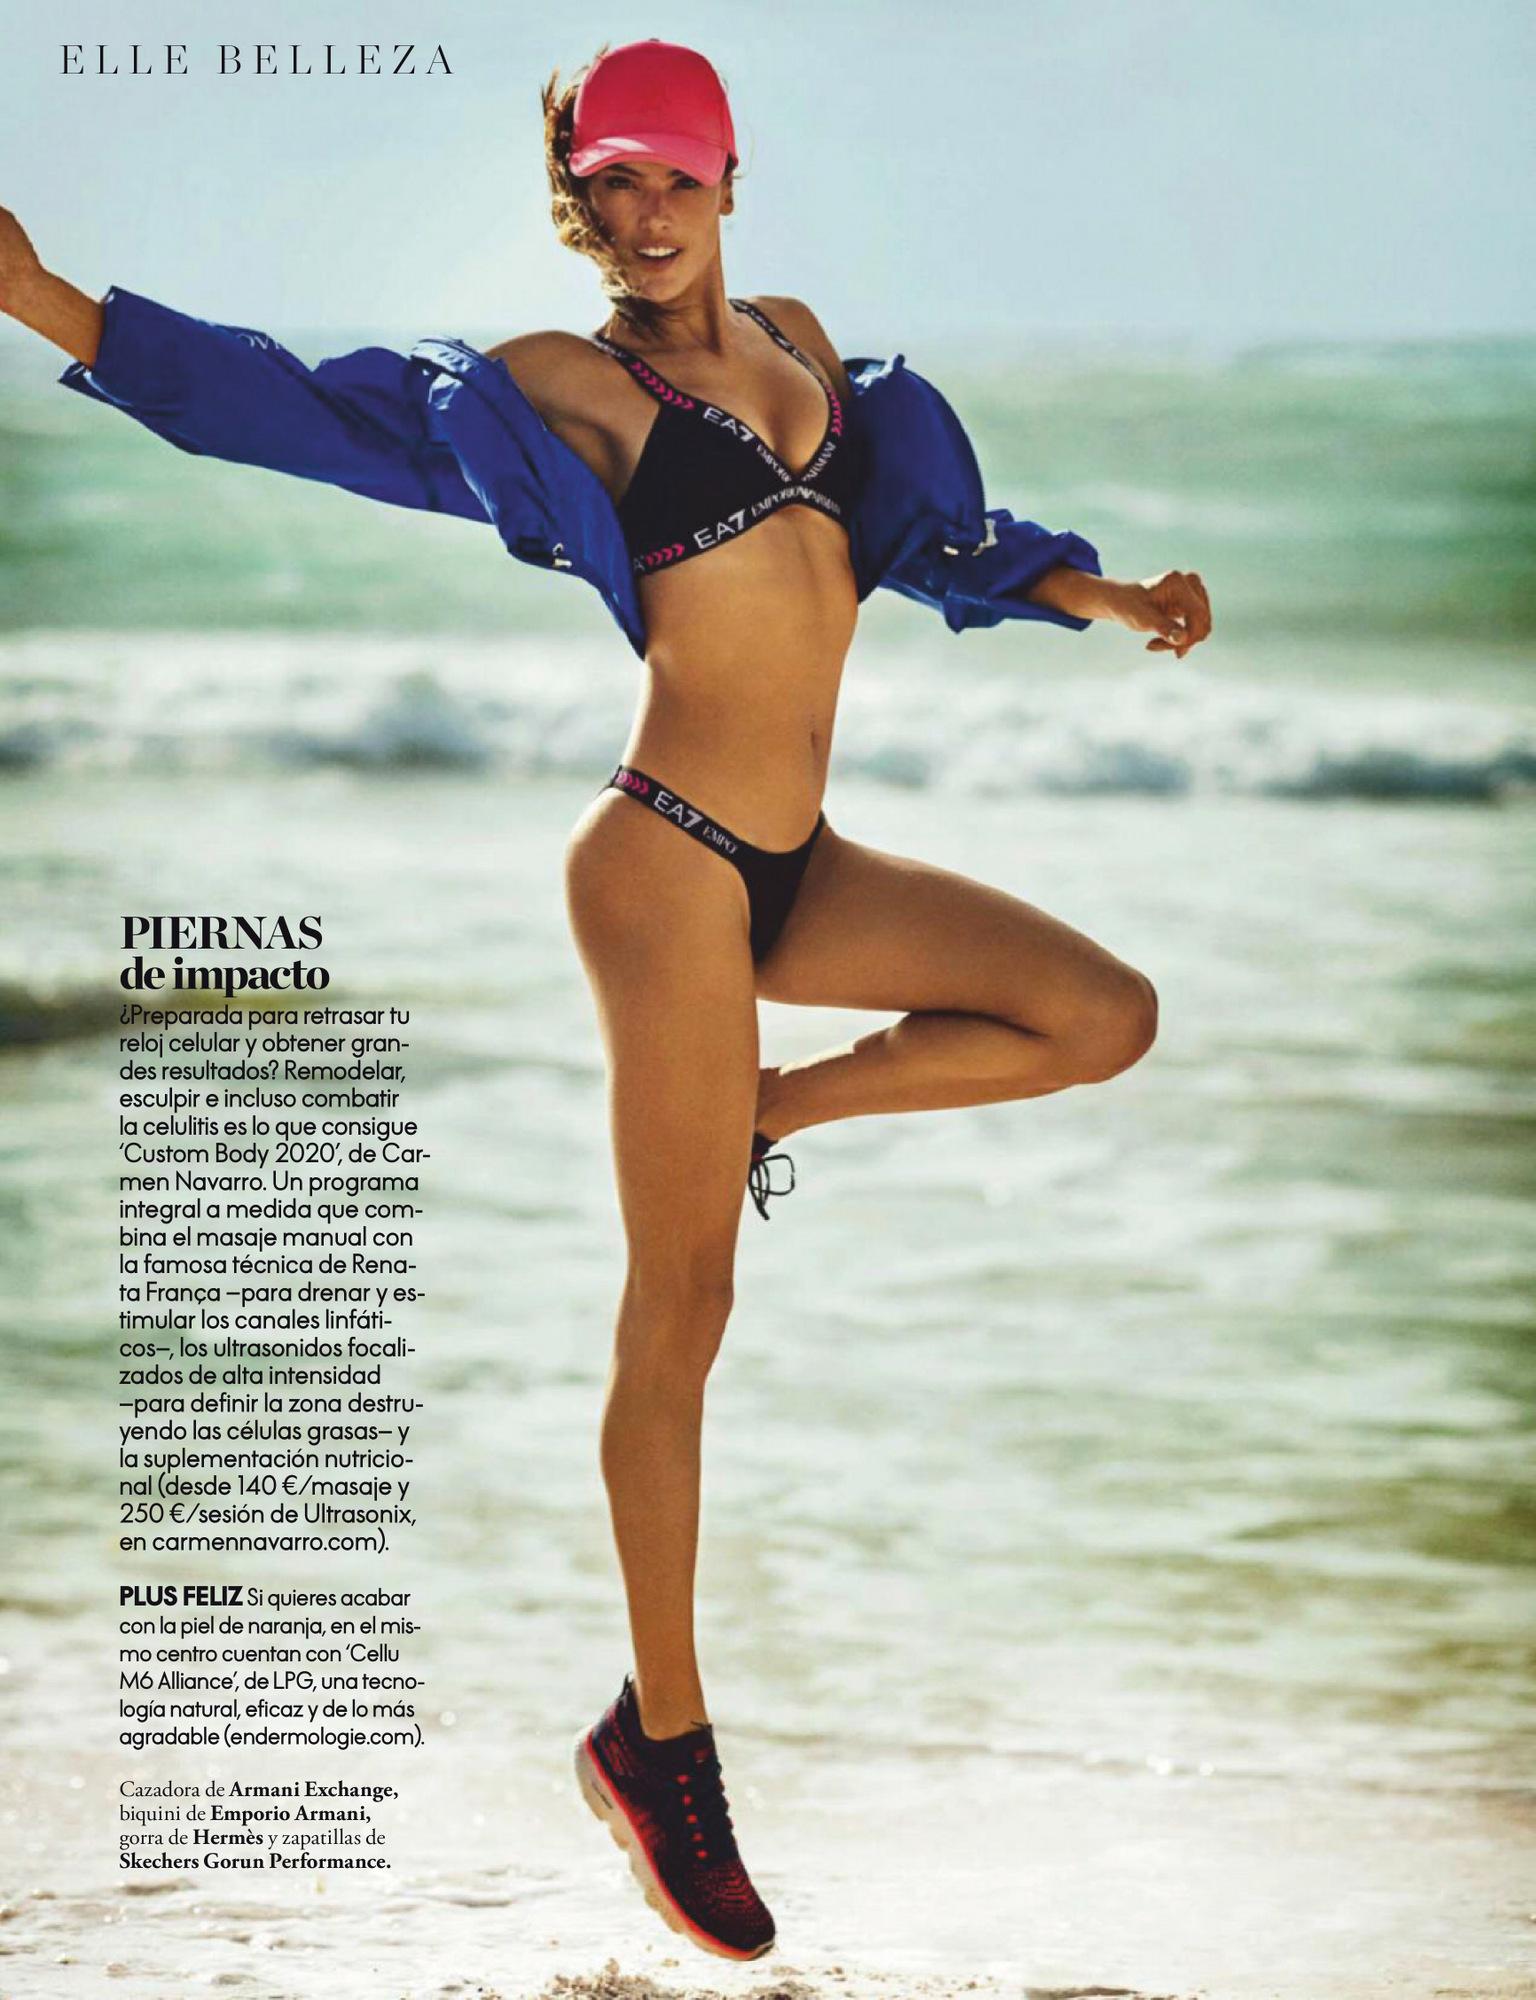 Alessandra Ambrosio – Beautiful Boobs In Sexy Photoshoot For Elle Spain Magazine (june 2020) 0003